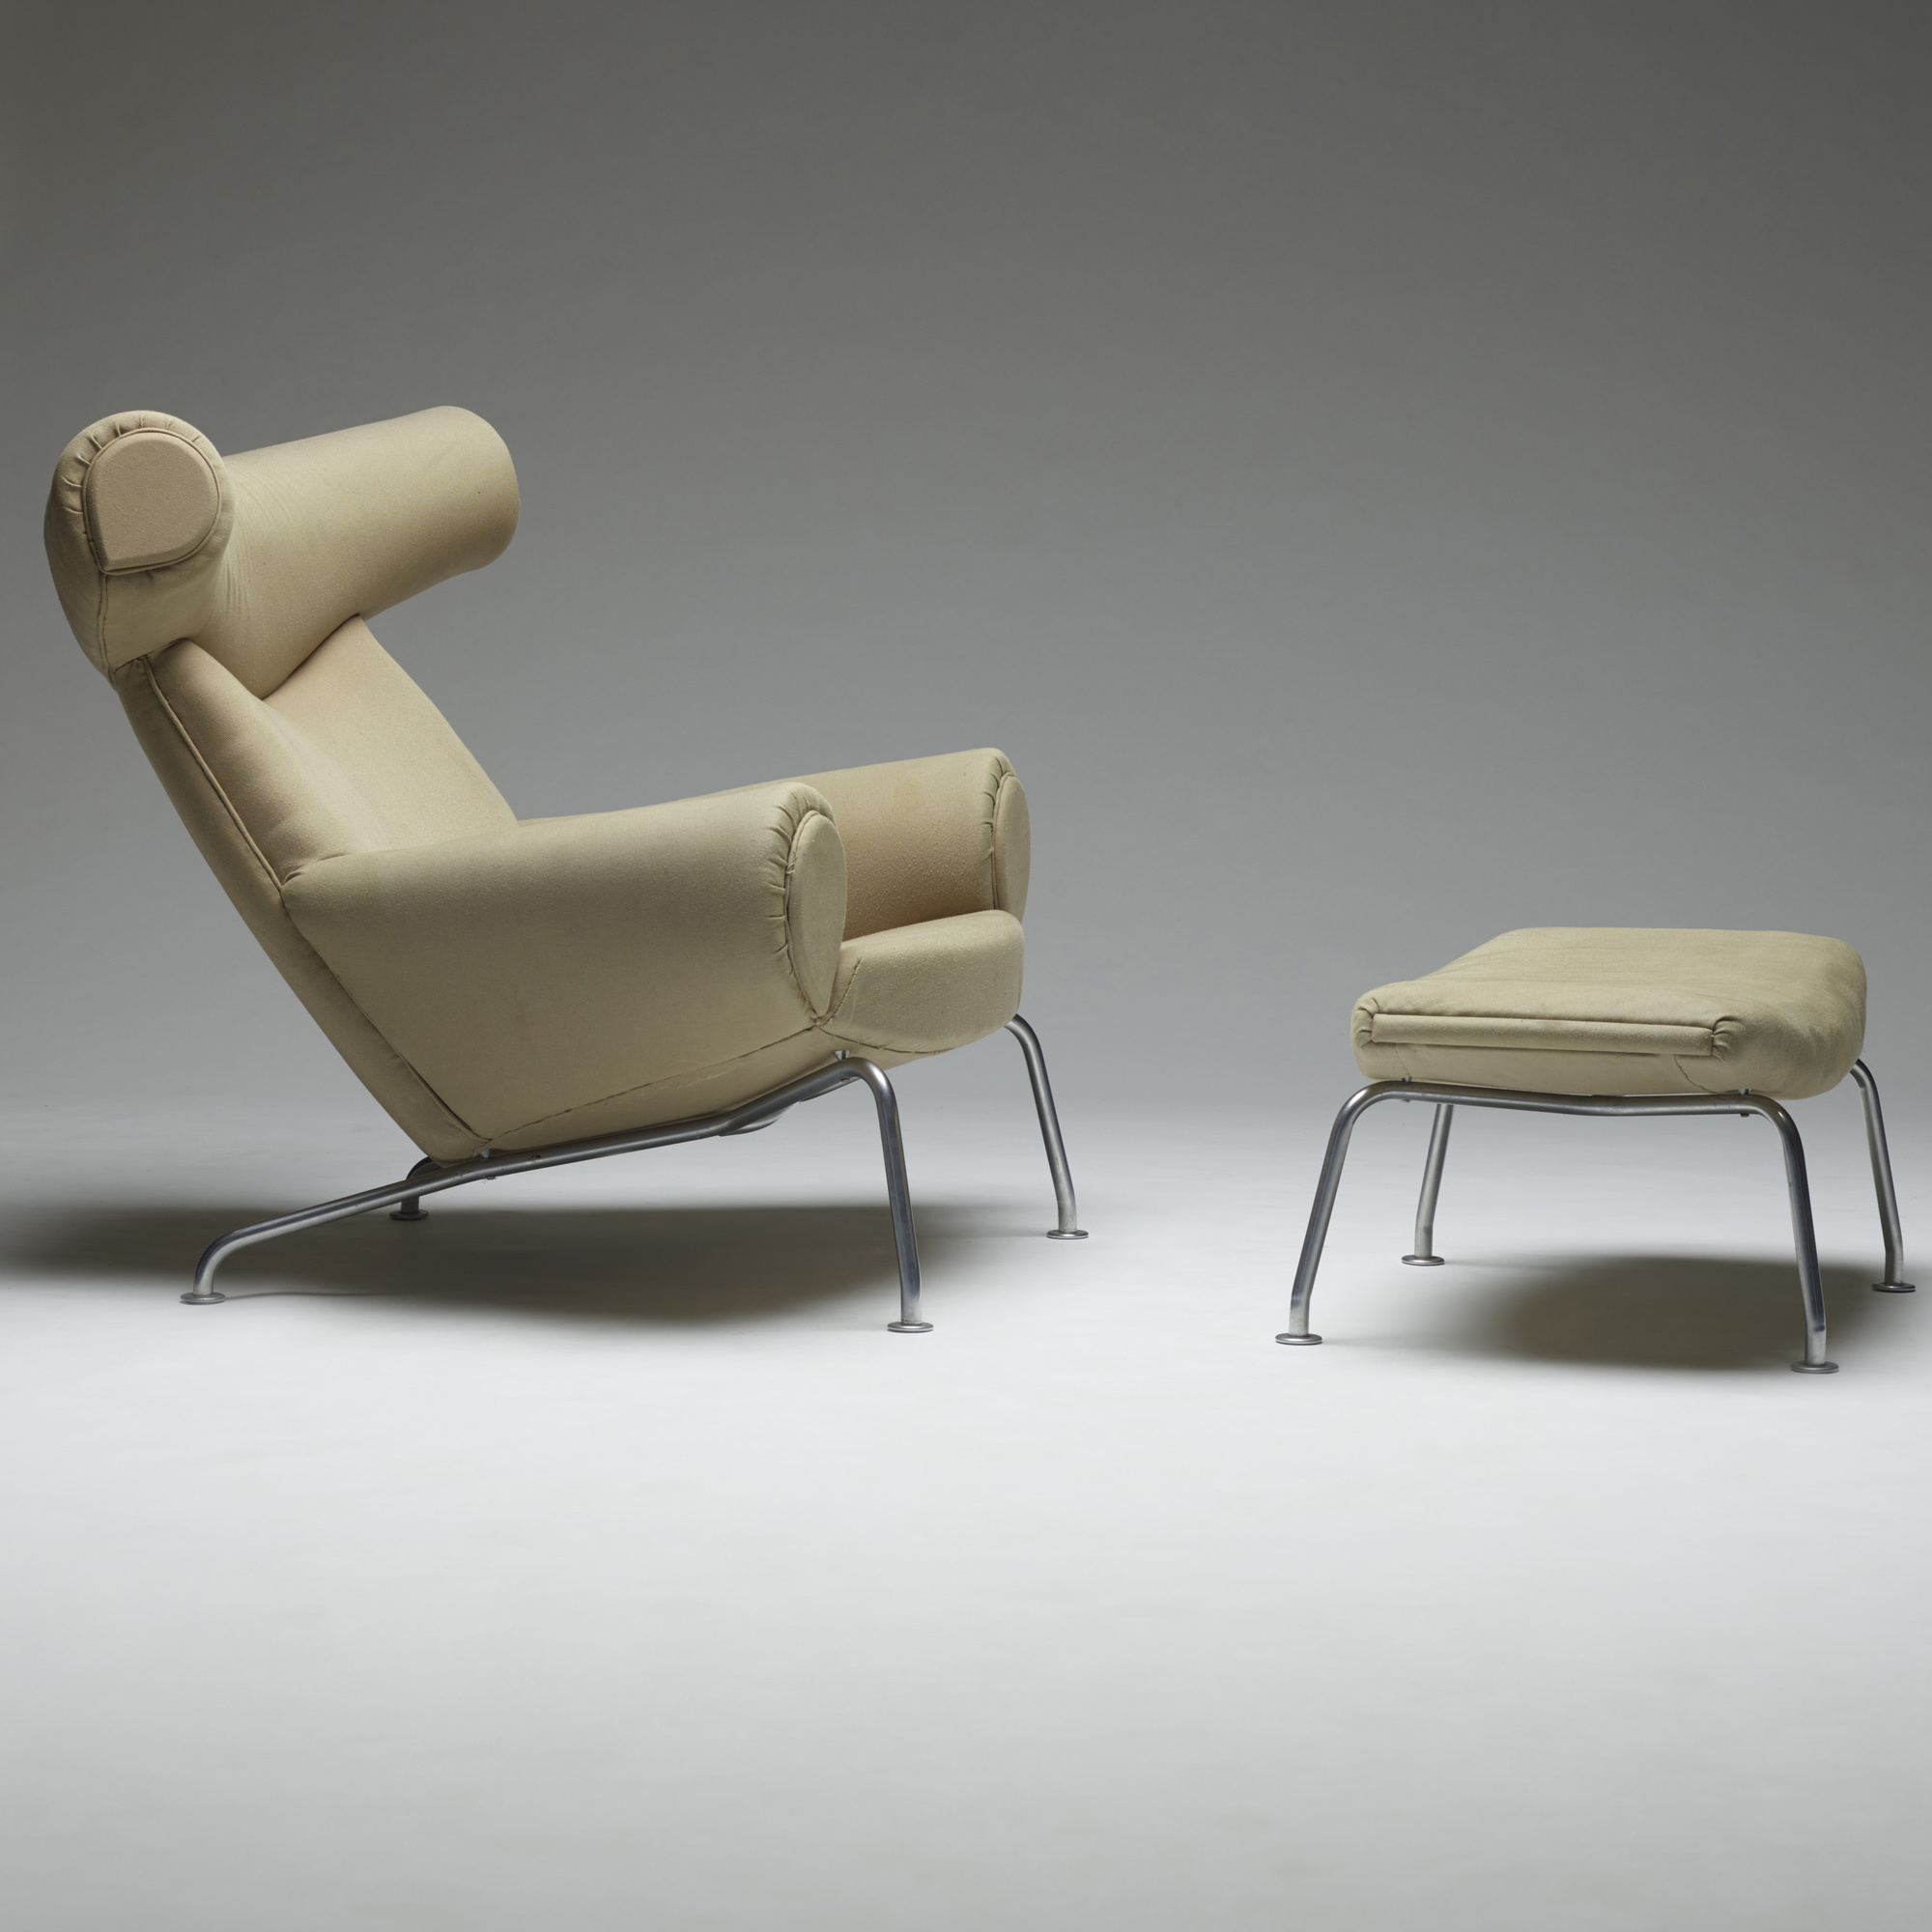 156: Hans J. Wegner / Ox chair and ottoman (3 of 4)